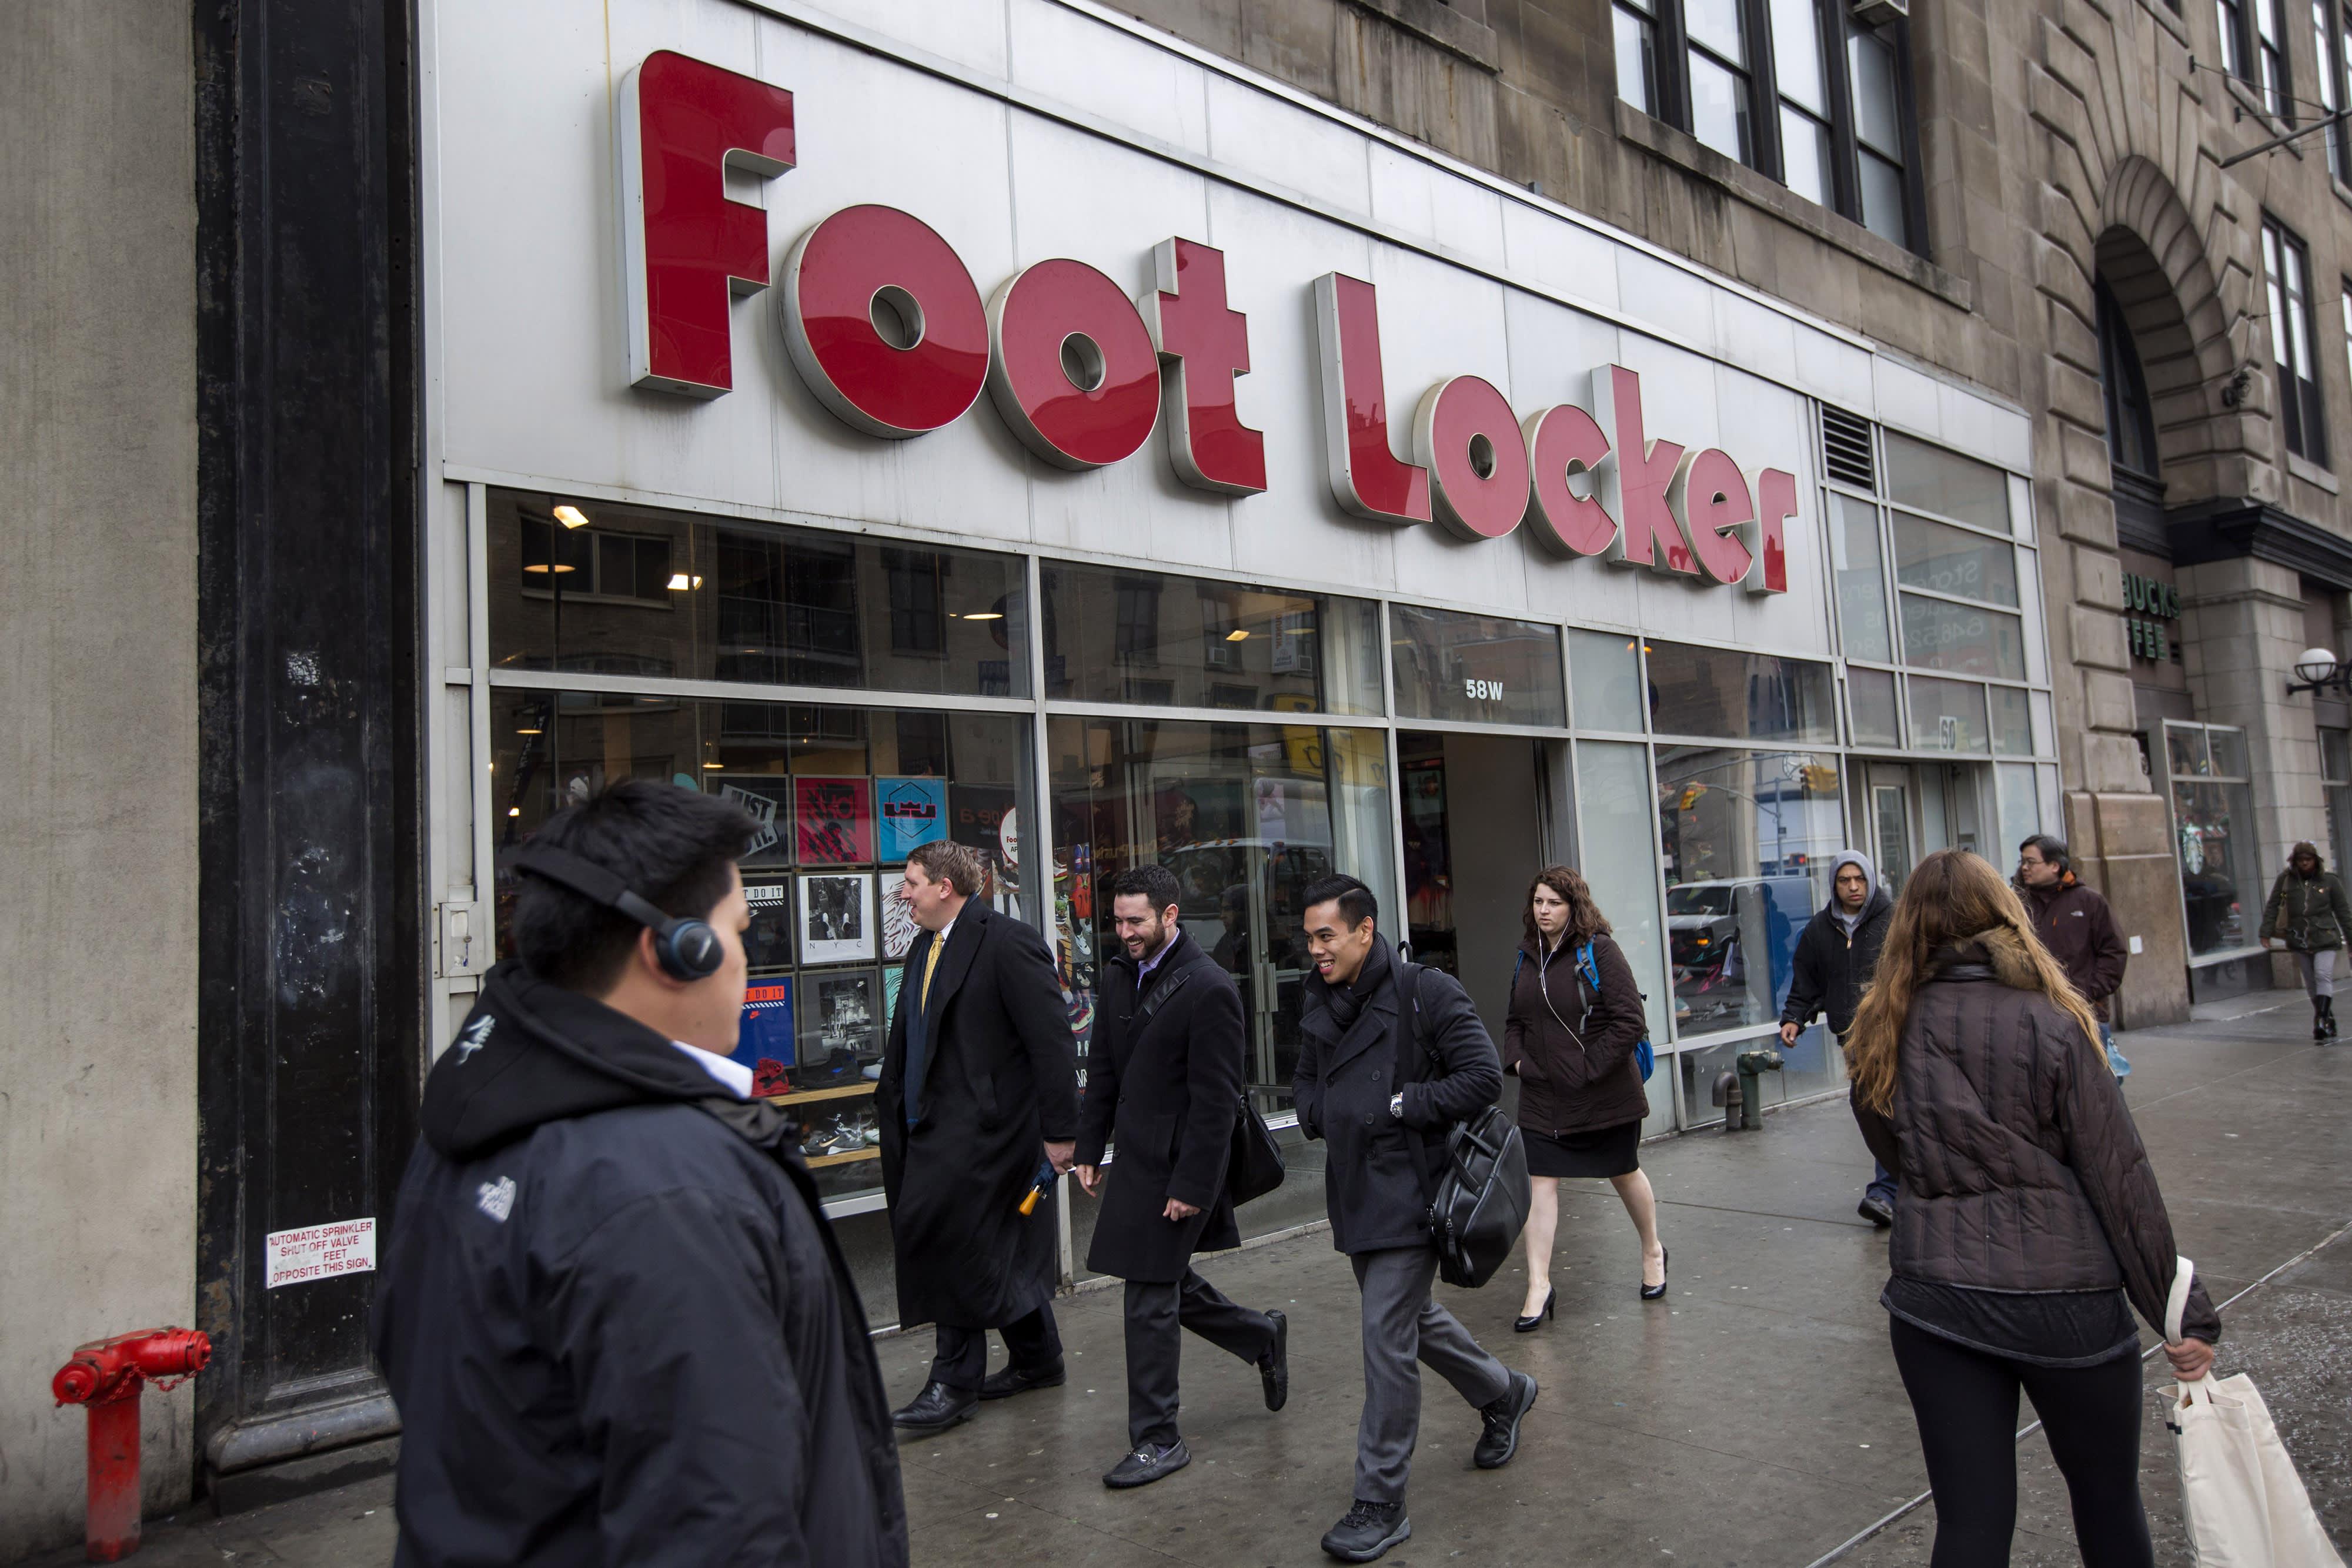 185f961251 Nike too expensive? Analyst says buy Foot Locker instead